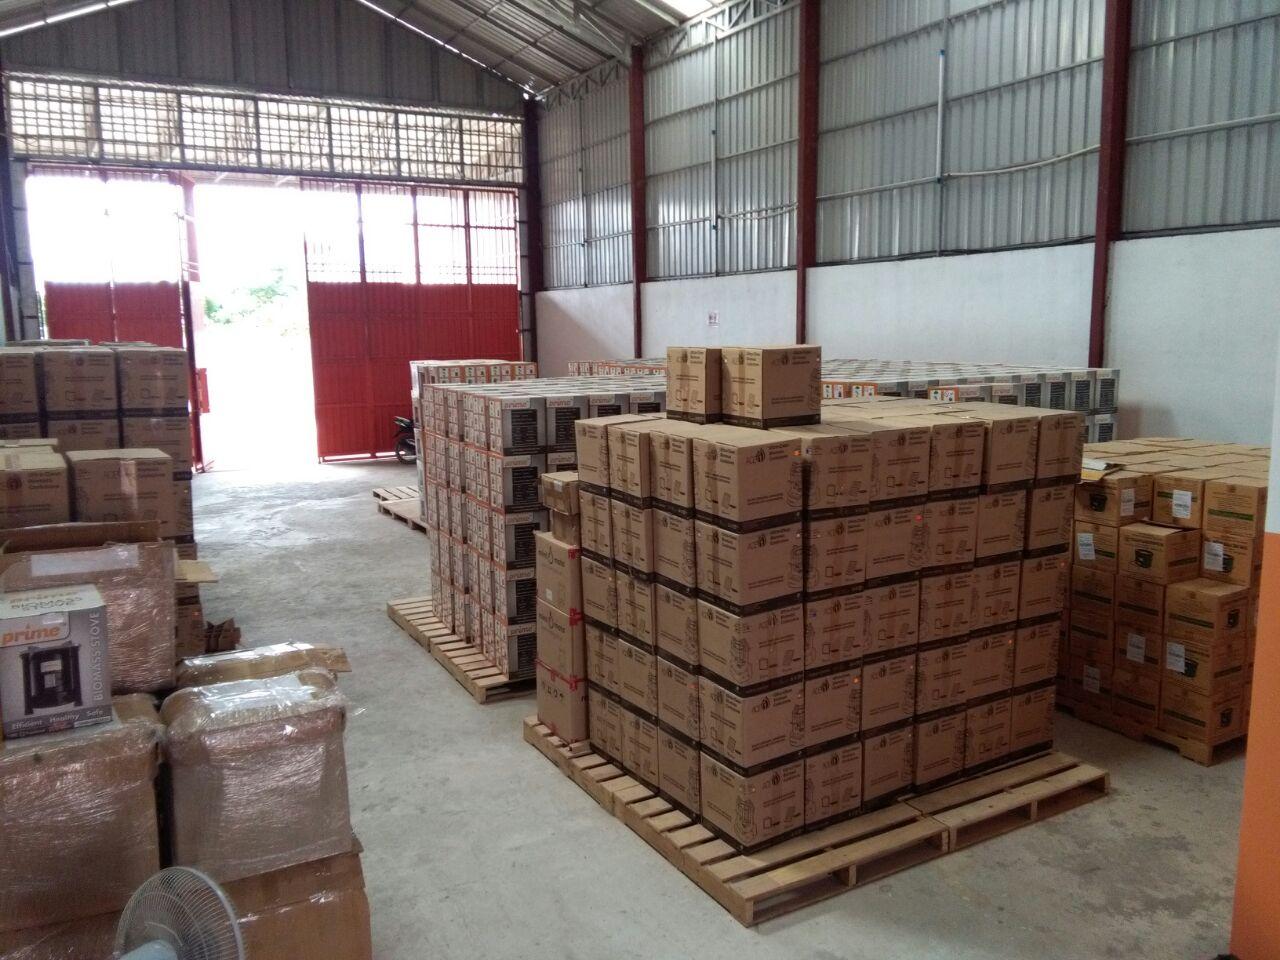 Photos: The Stove Auction warehouse in Phnom Penh, Cambodia